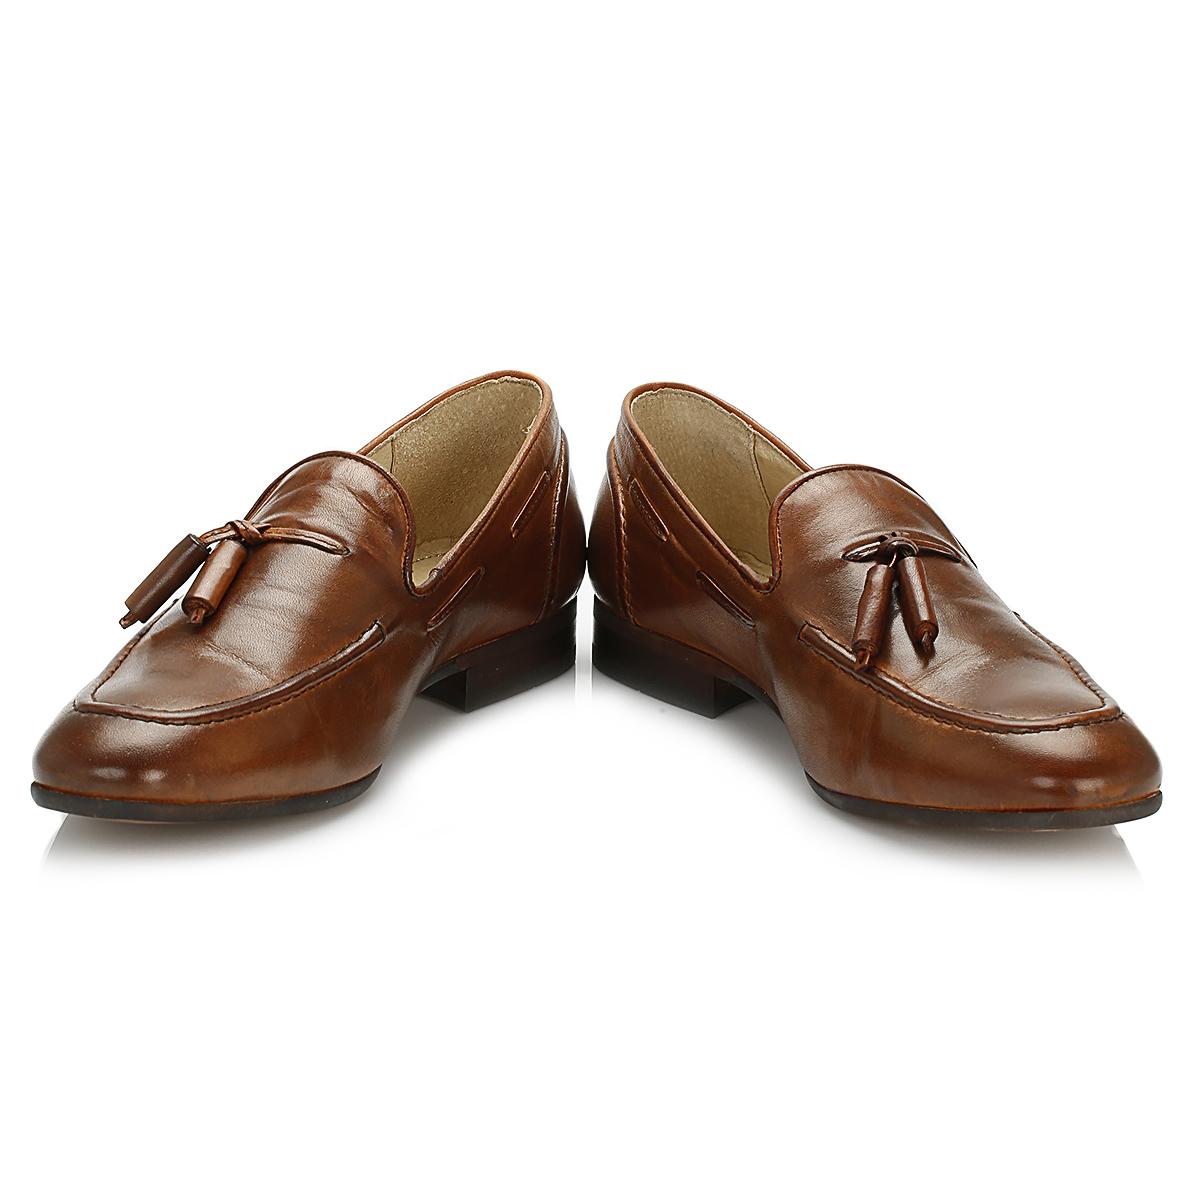 Hudson Uk Shoes